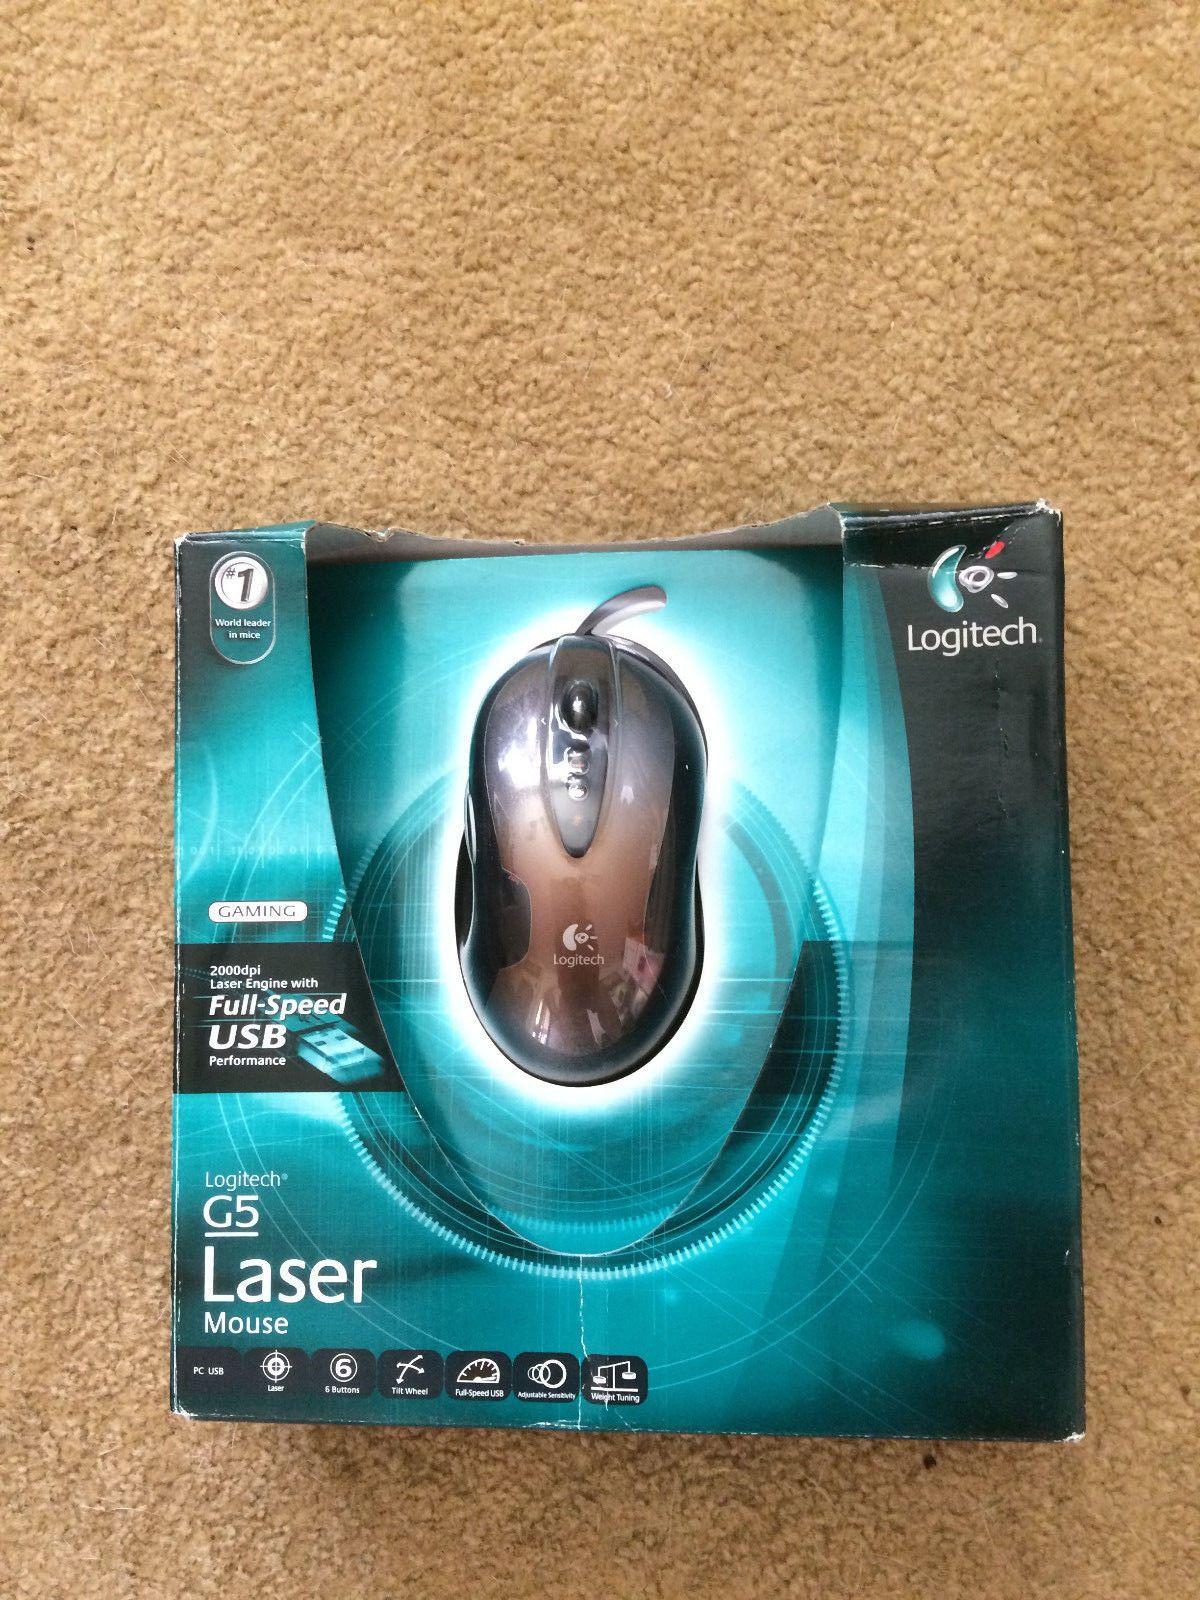 New Logitech G5 Laser Mouse (931376-0403)